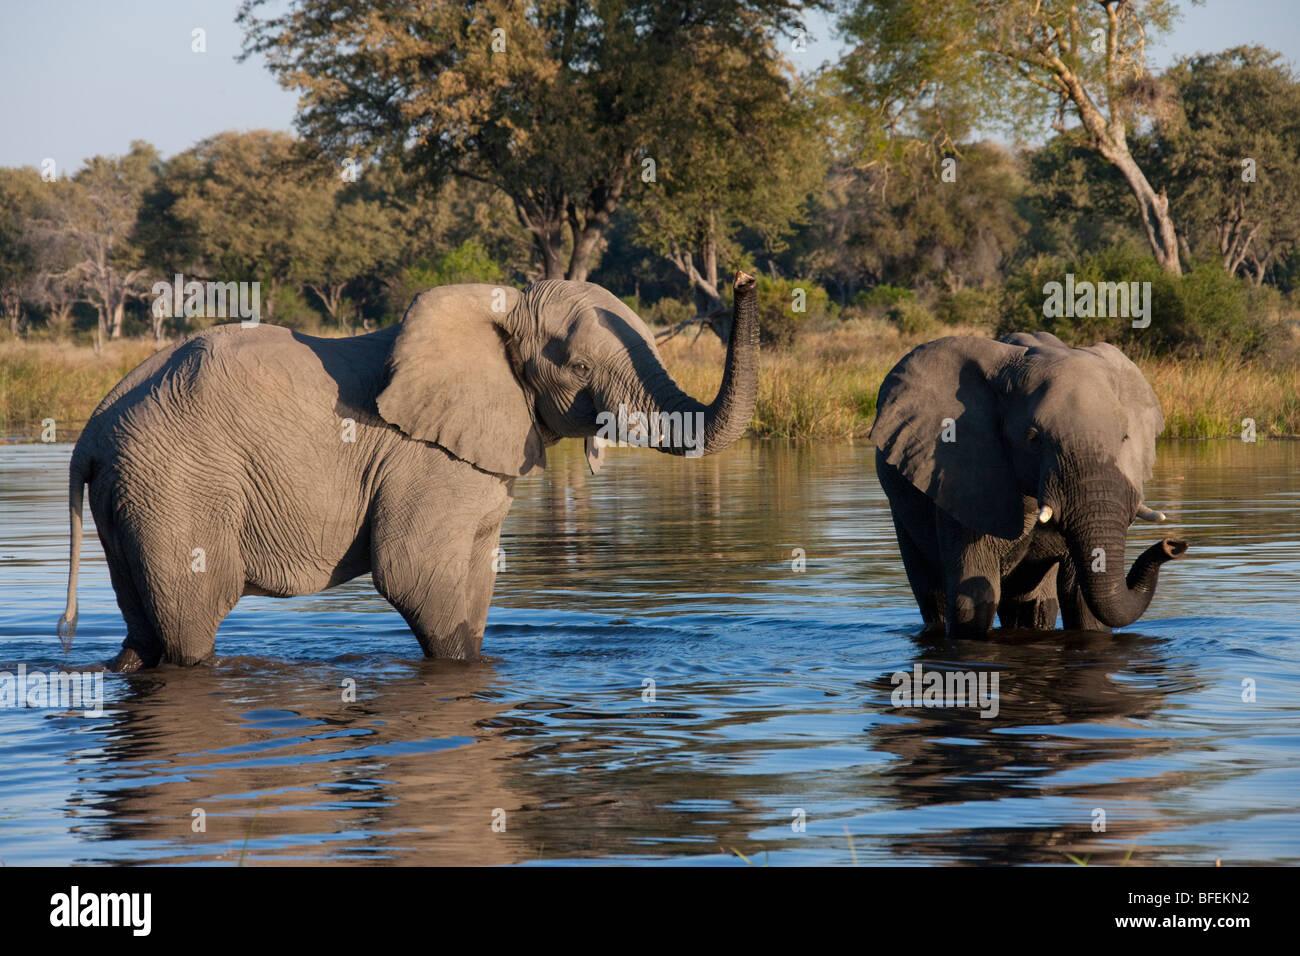 African Elephants (Loxodonta africana) in a waterhole in the Savuti region of Botswana - Stock Image